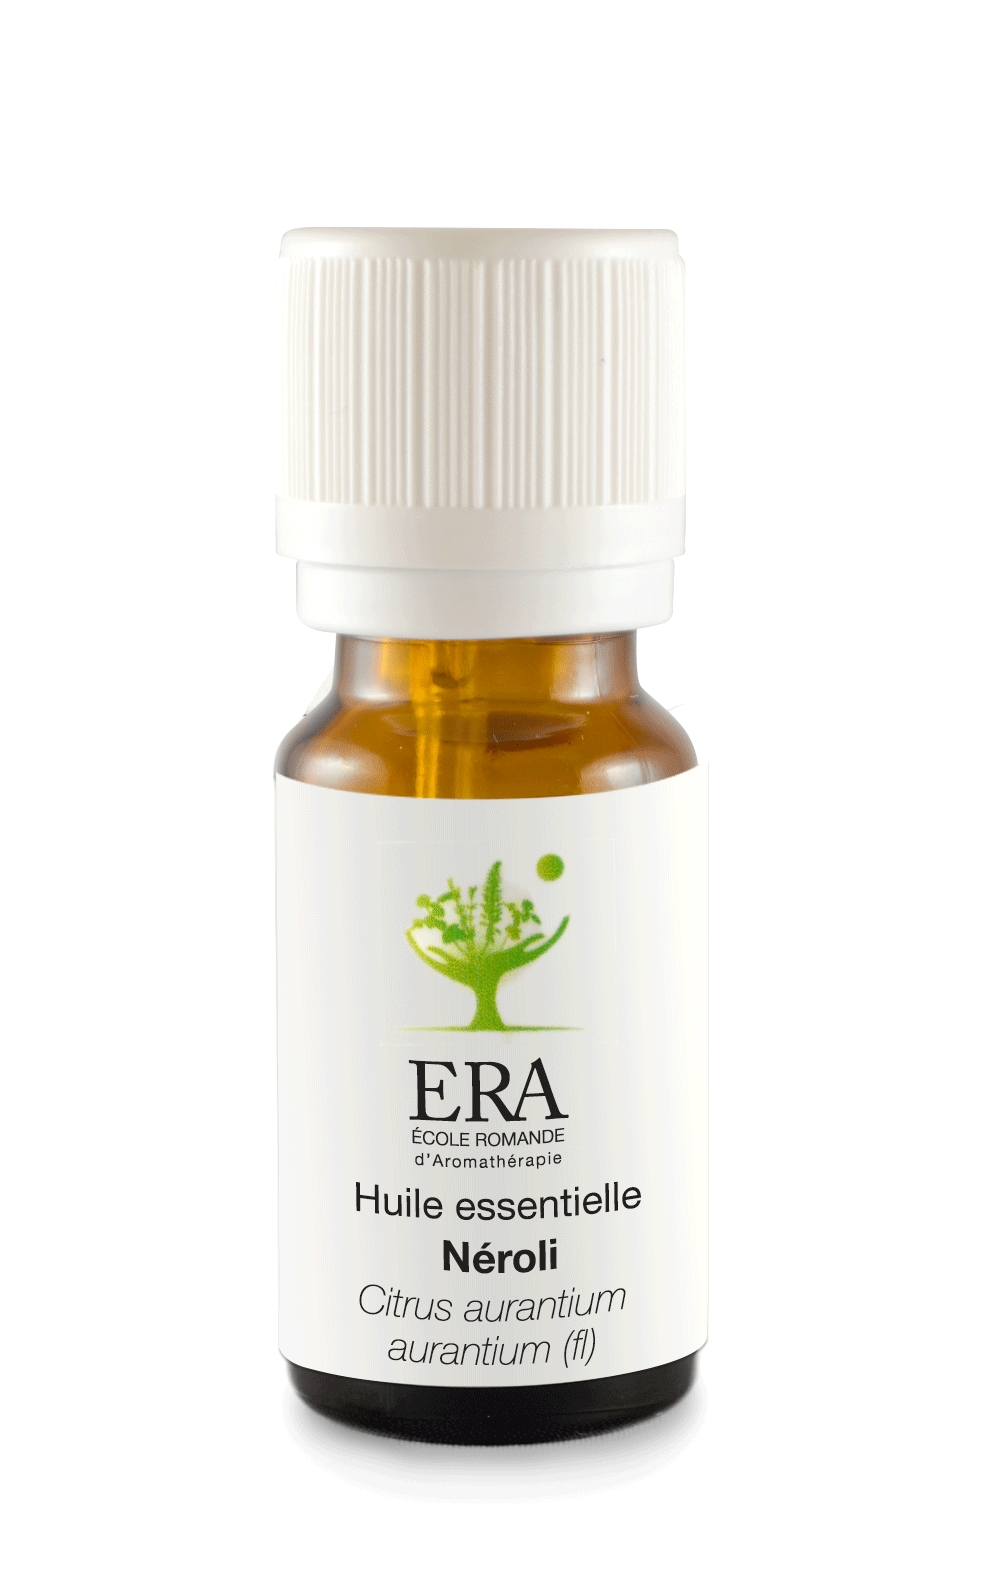 Néroli - Citrus aurantium aurantium (fl) - Rutacées